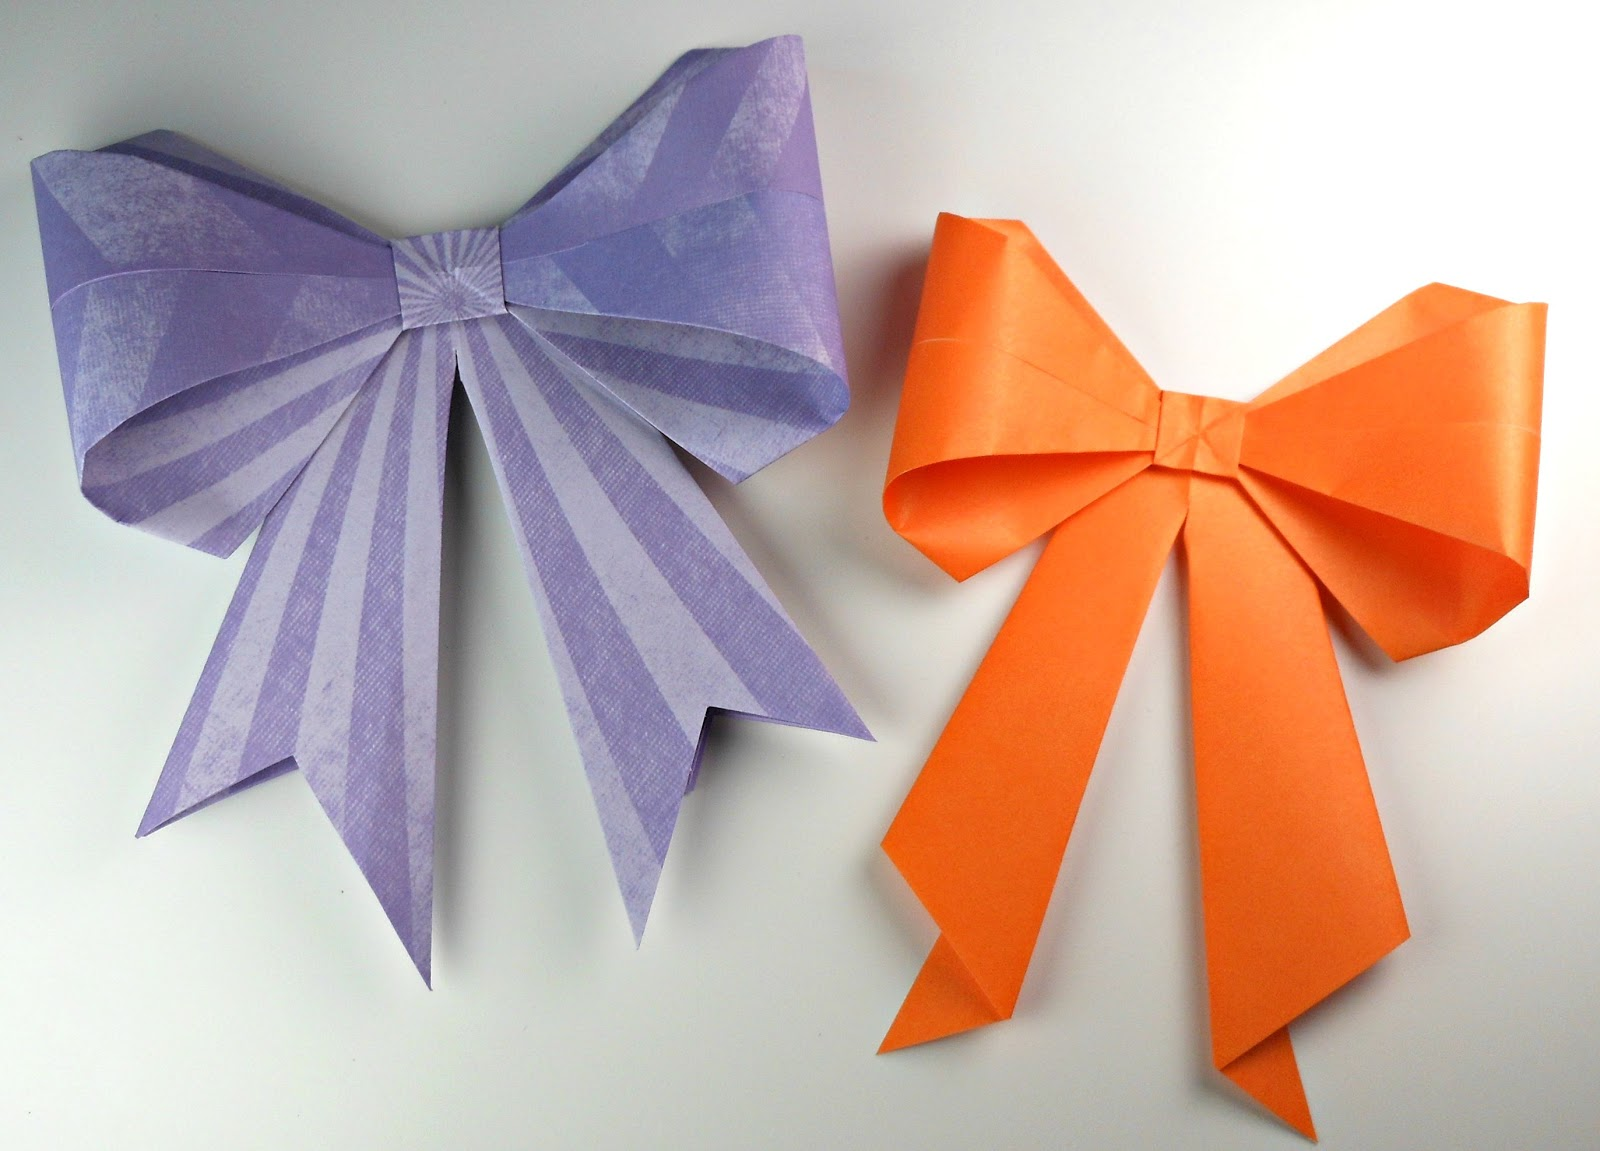 Mundo party c mo hacer un lazo de origami - Manualidades con lazos ...